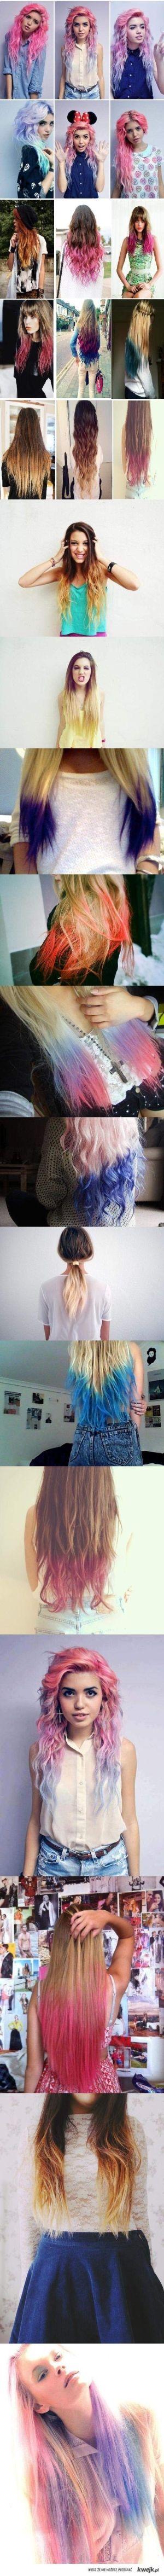 colorful hair by Rachael Girot